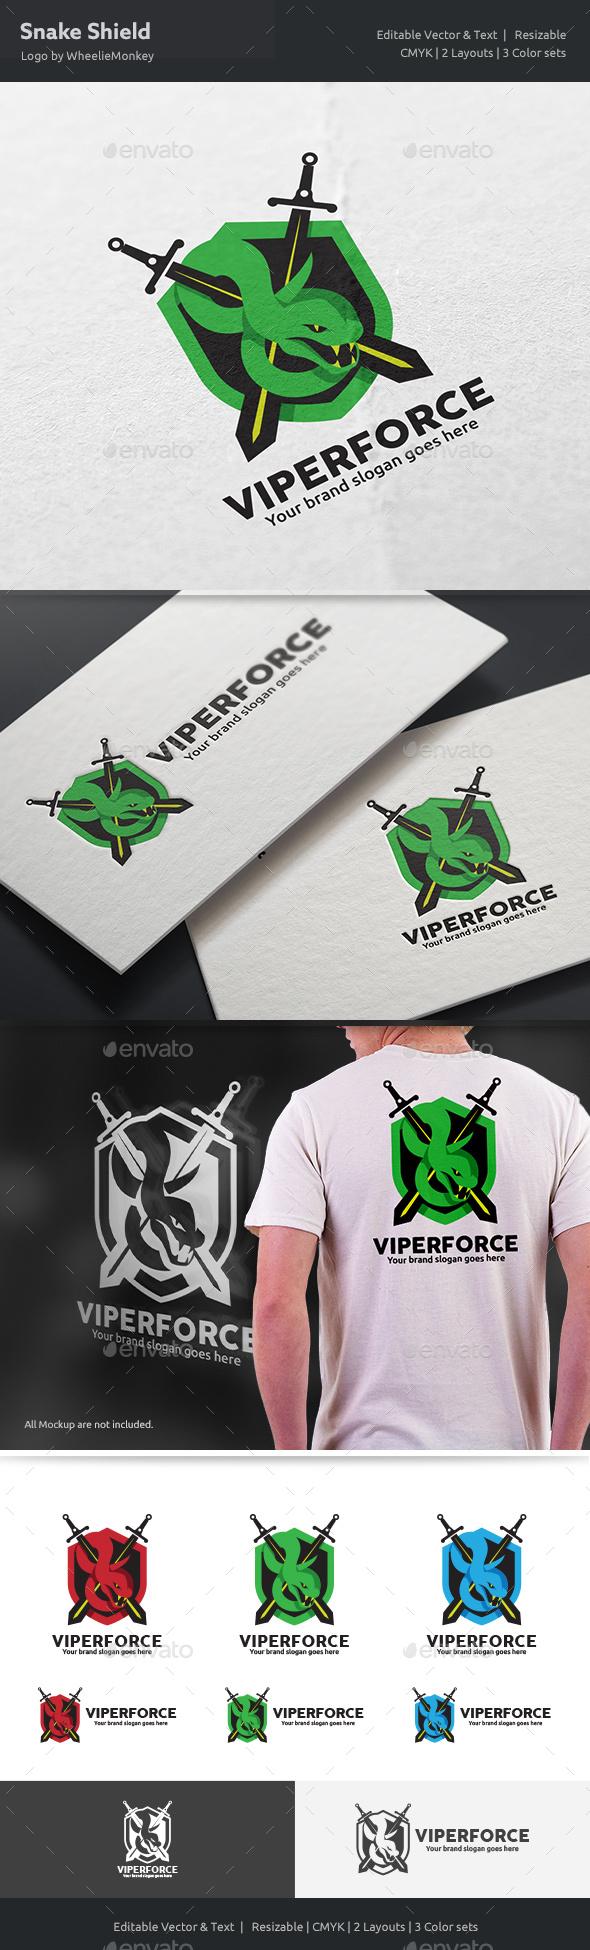 Snake Shield Logo - Vector Abstract